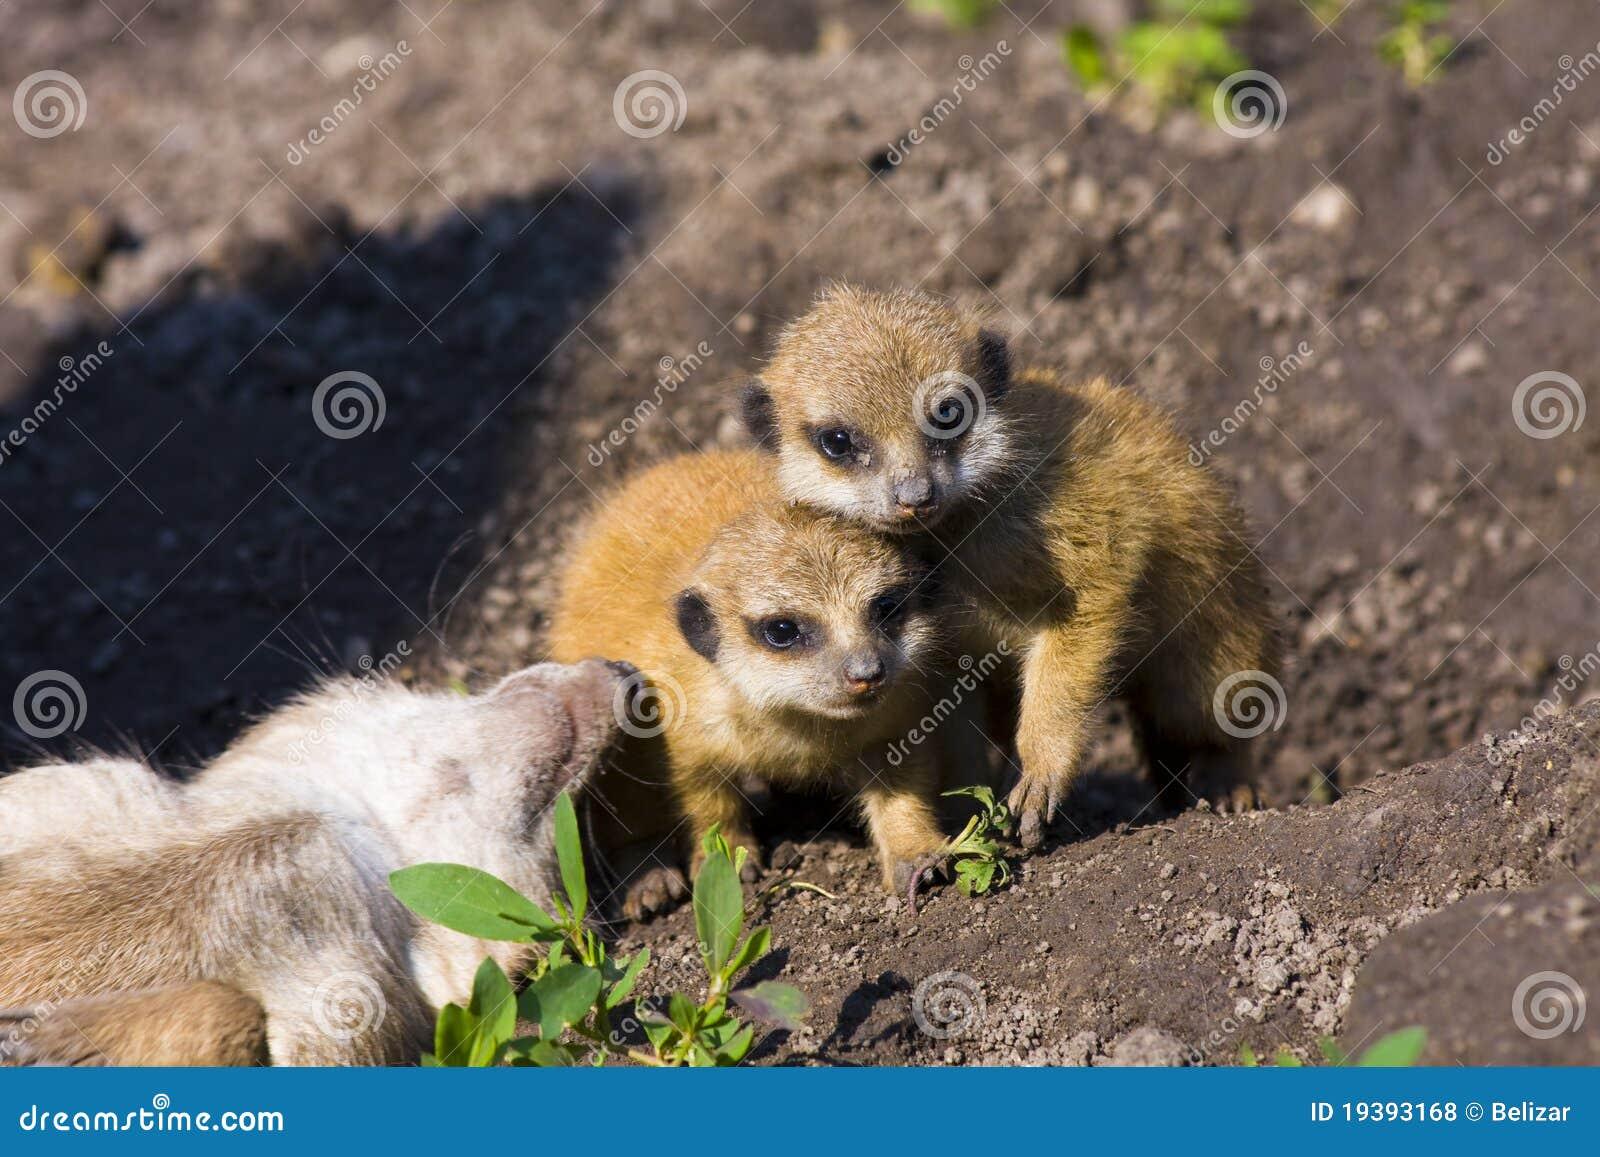 Baby meerkats (Suricata suricatta)